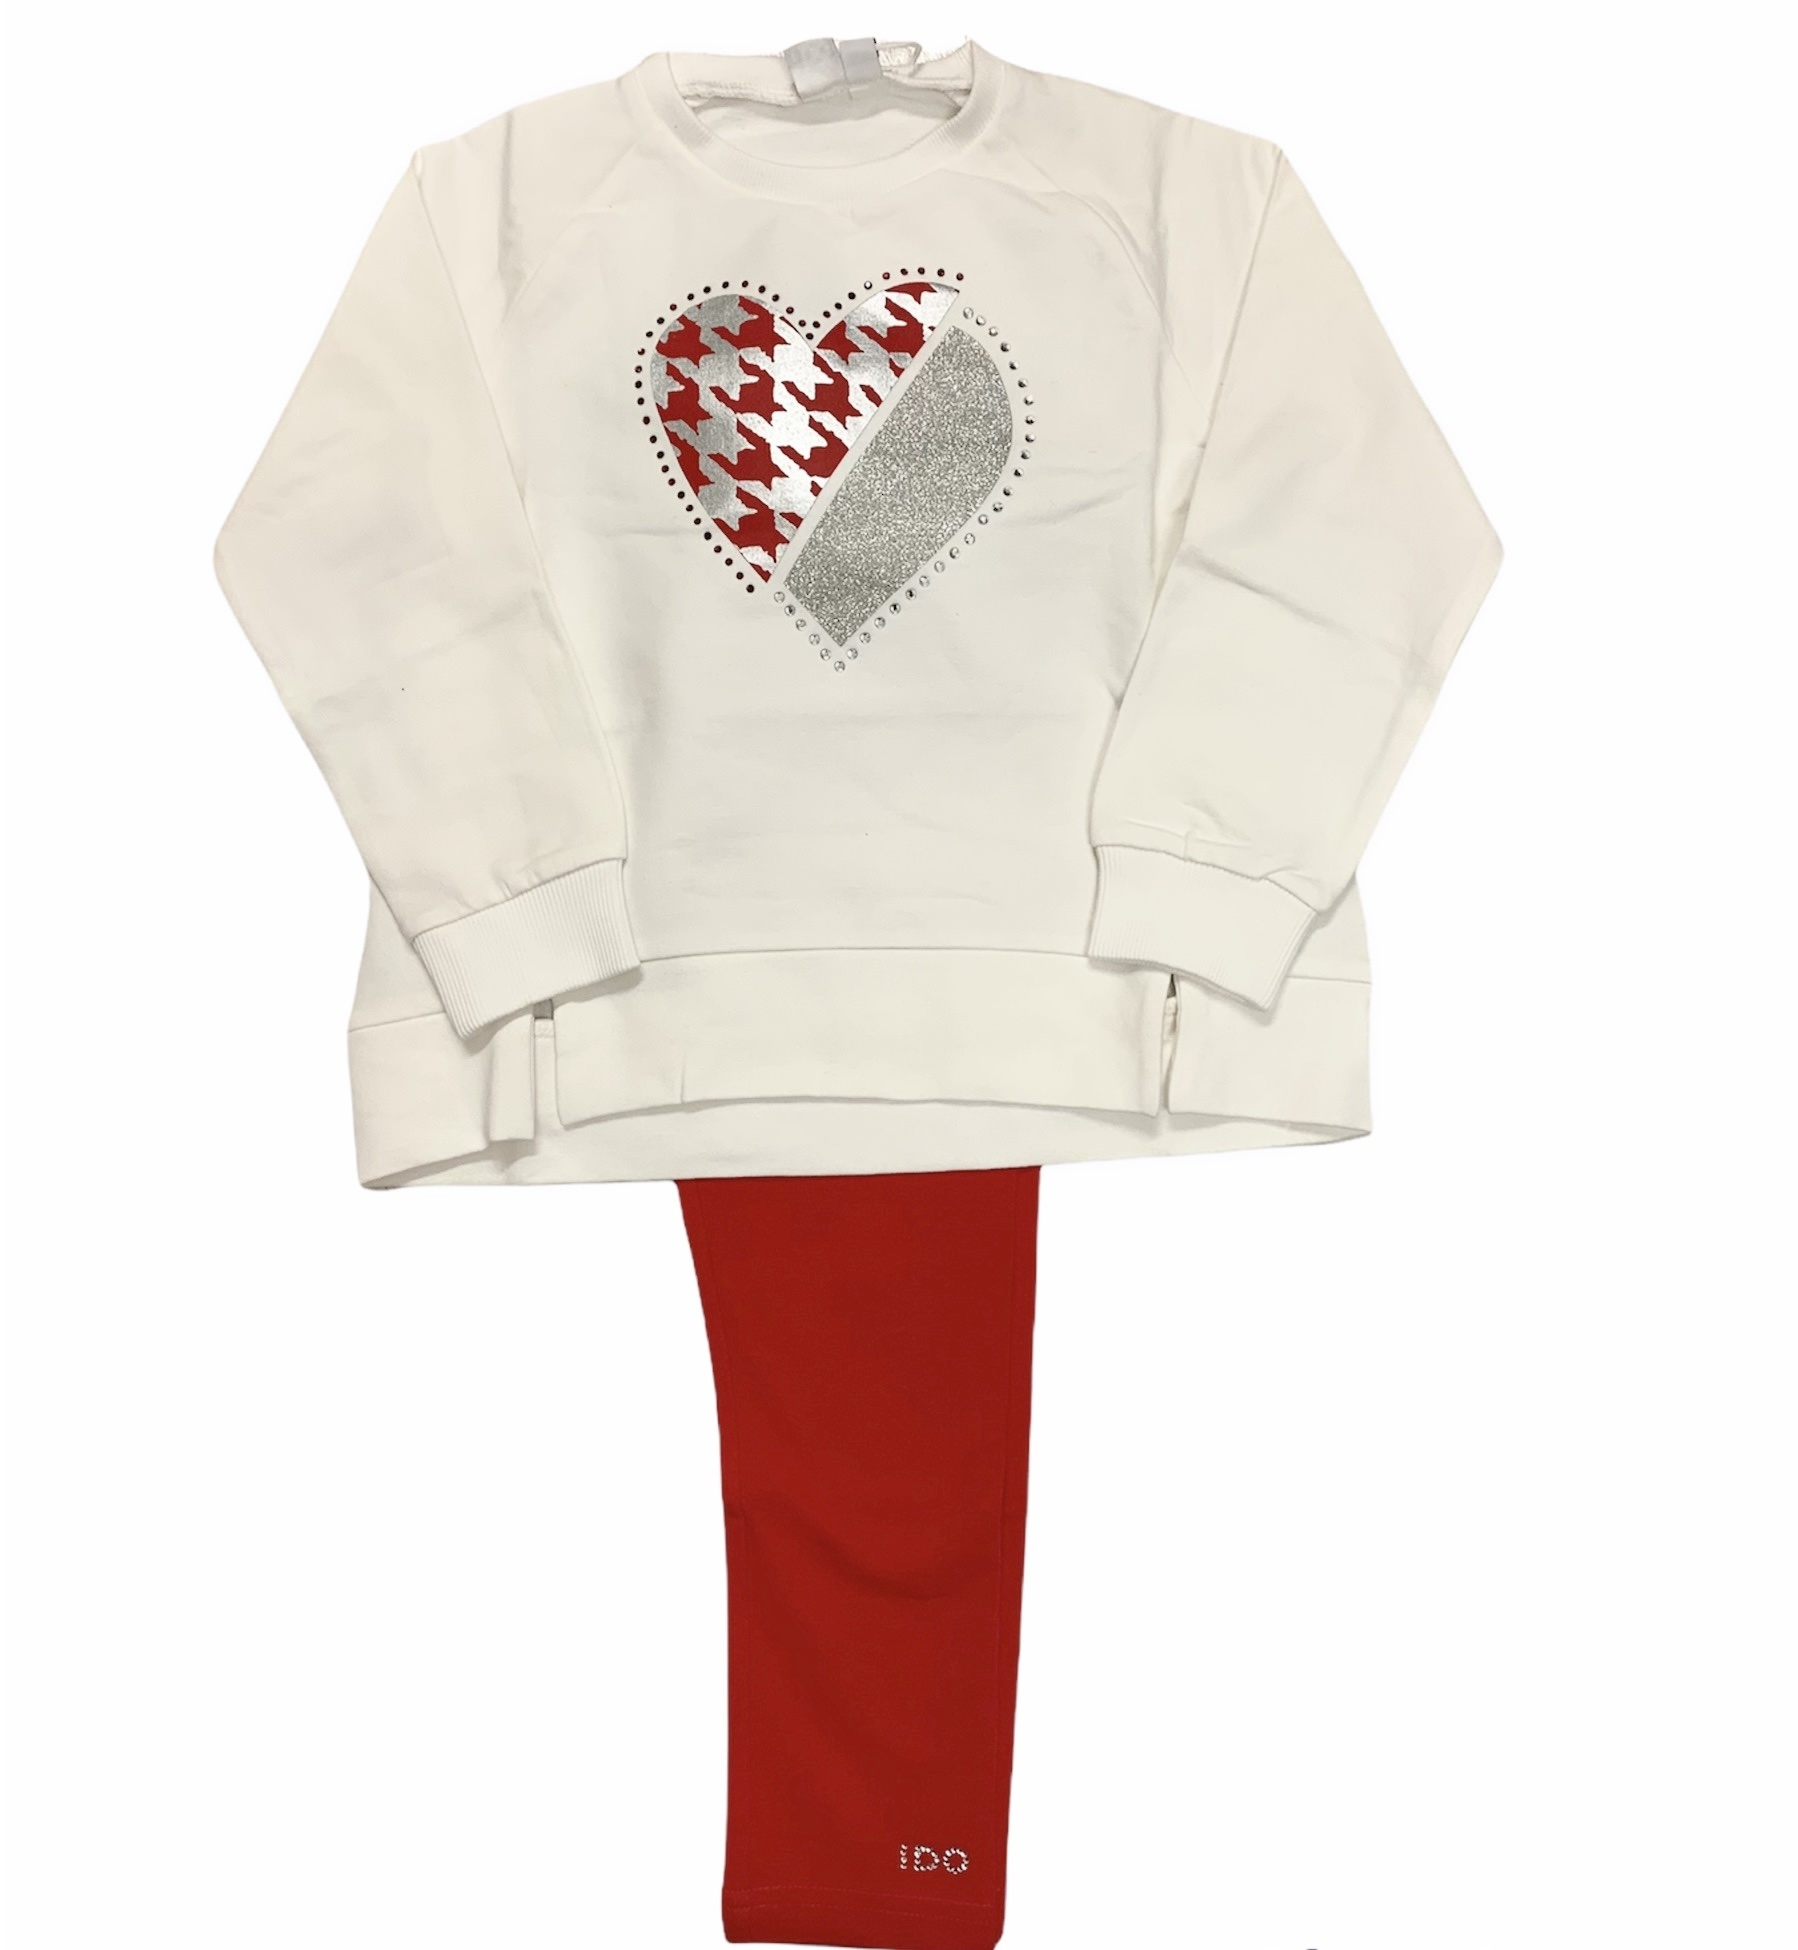 Ido iDO Love Heart Sweatshirt Set